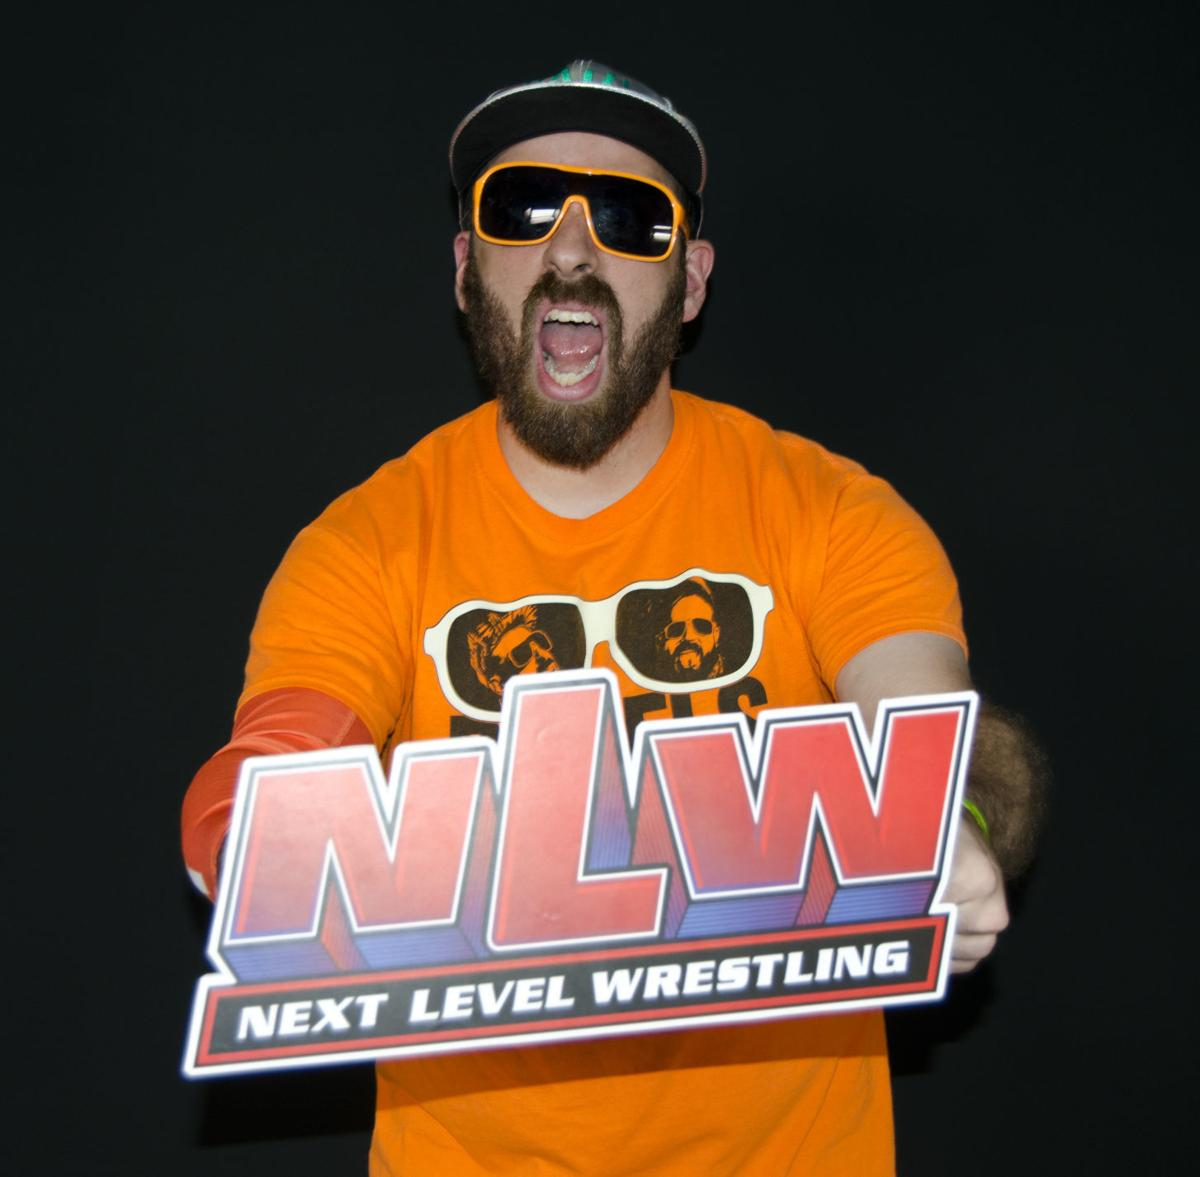 Next Level Wrestling 1